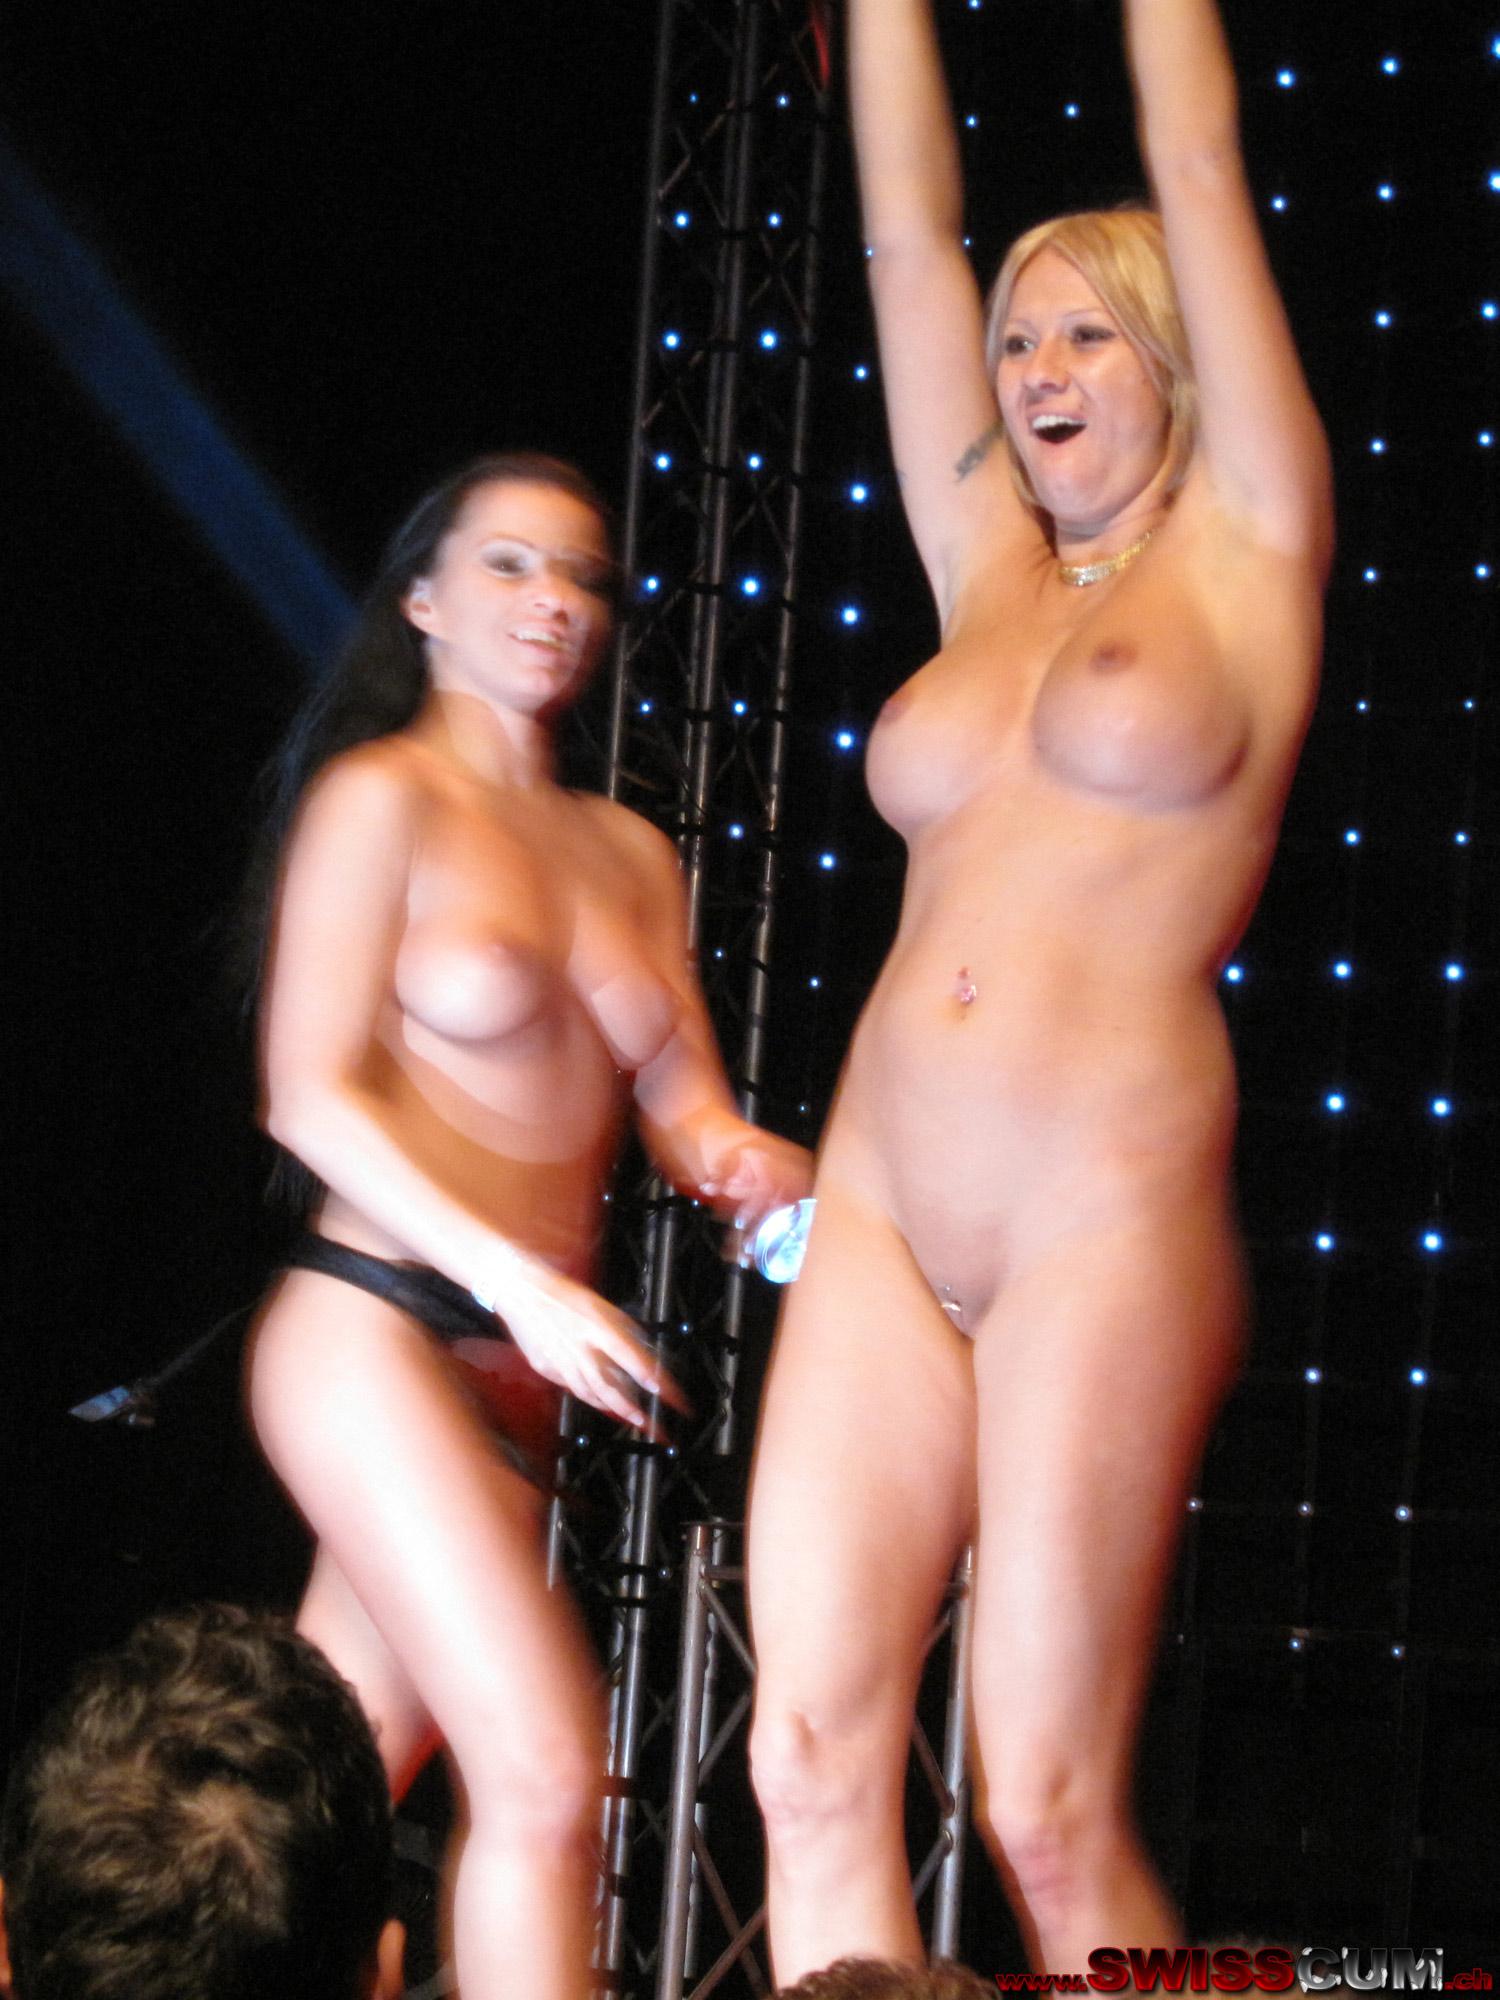 Extasia erotikmesse basel tamara joyce - 4 3